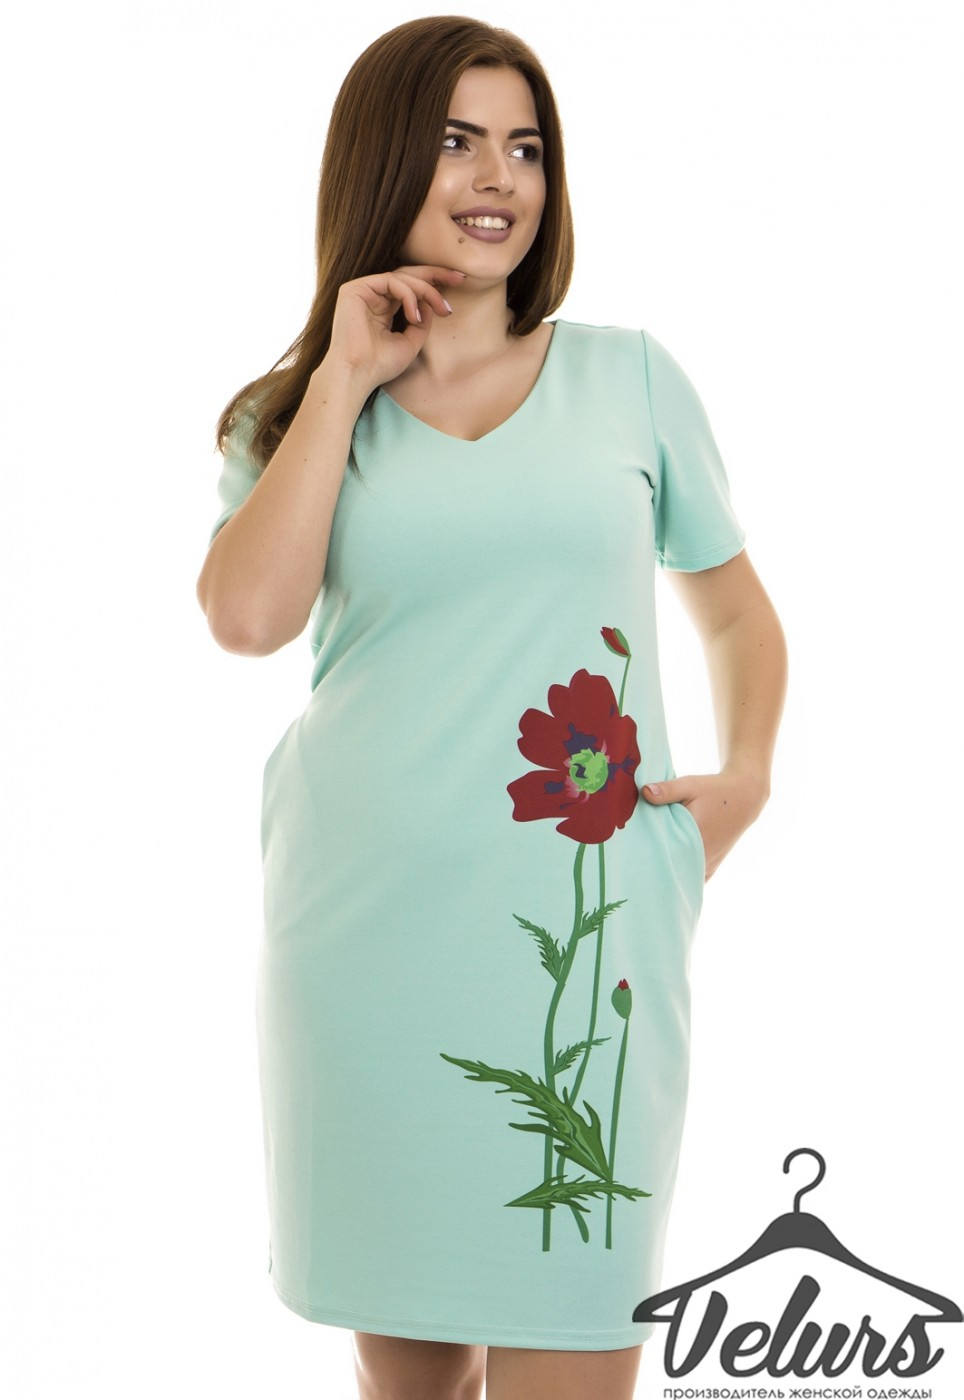 Velurs: Платье 212066 - фото 8